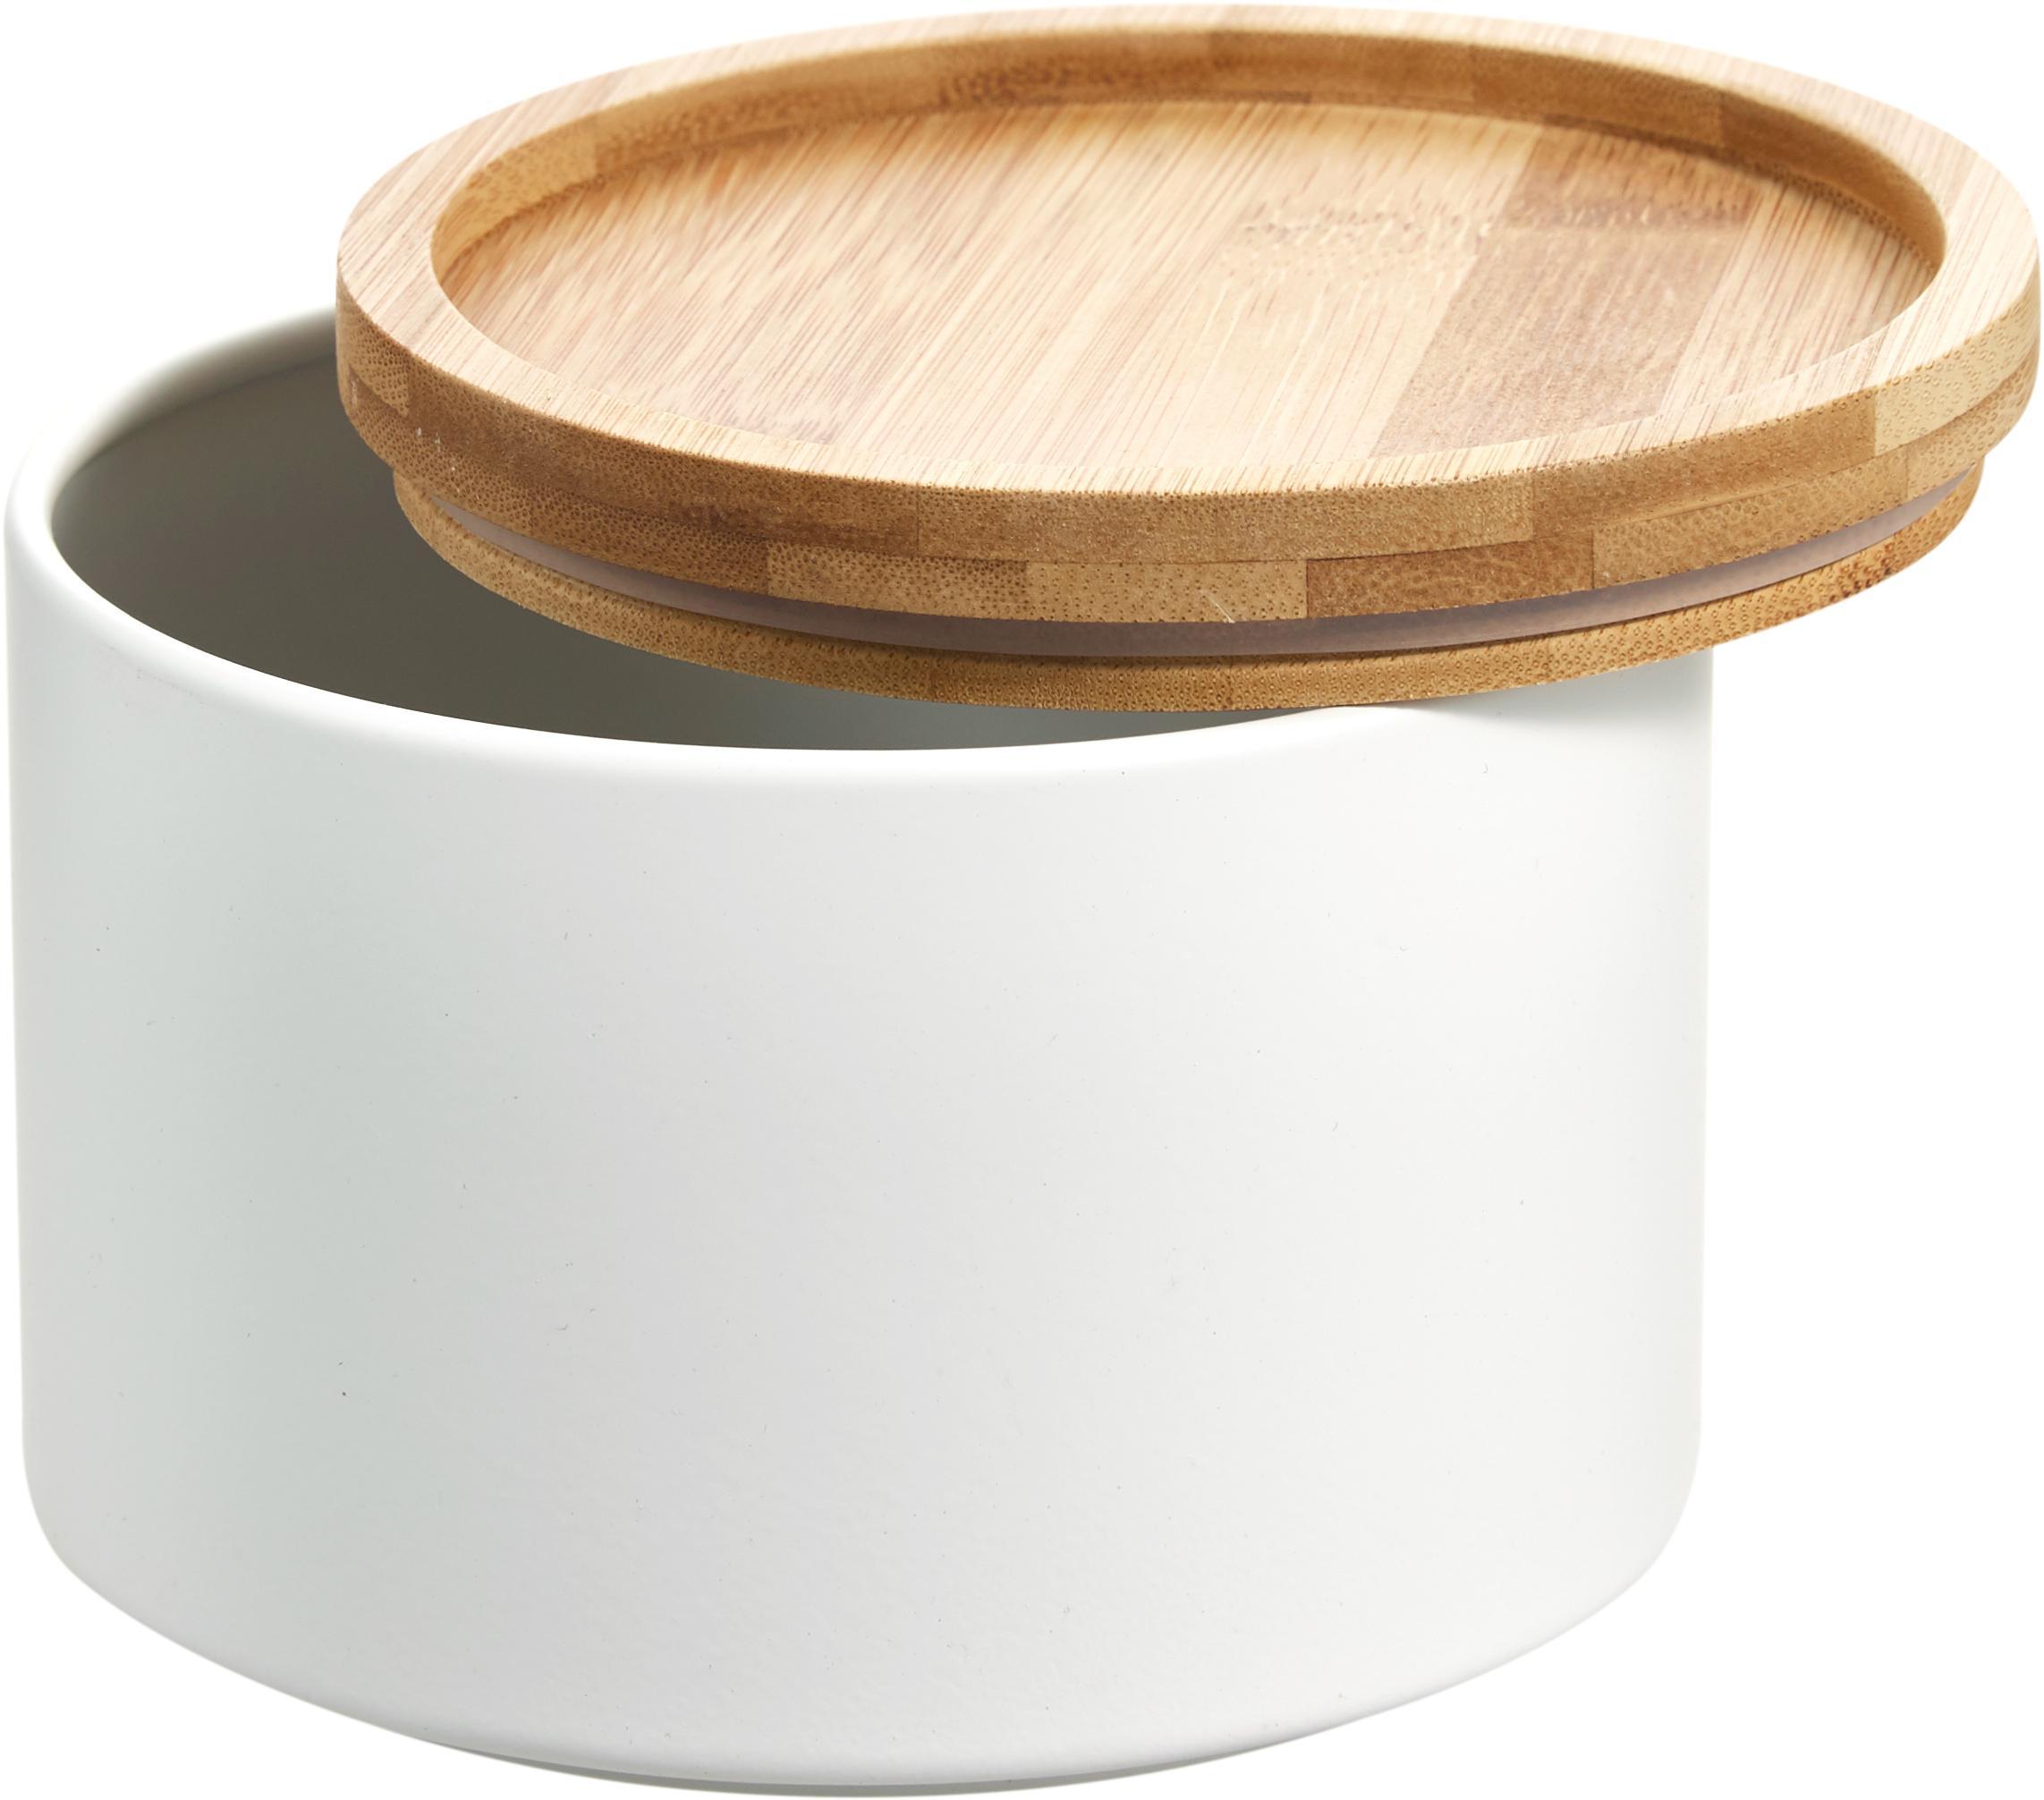 Metalen opbergpot Bambel, stapelbaar, Pot: gelakt metaal, Deksel: bamboe, Wit, Ø 13 x H 10 cm